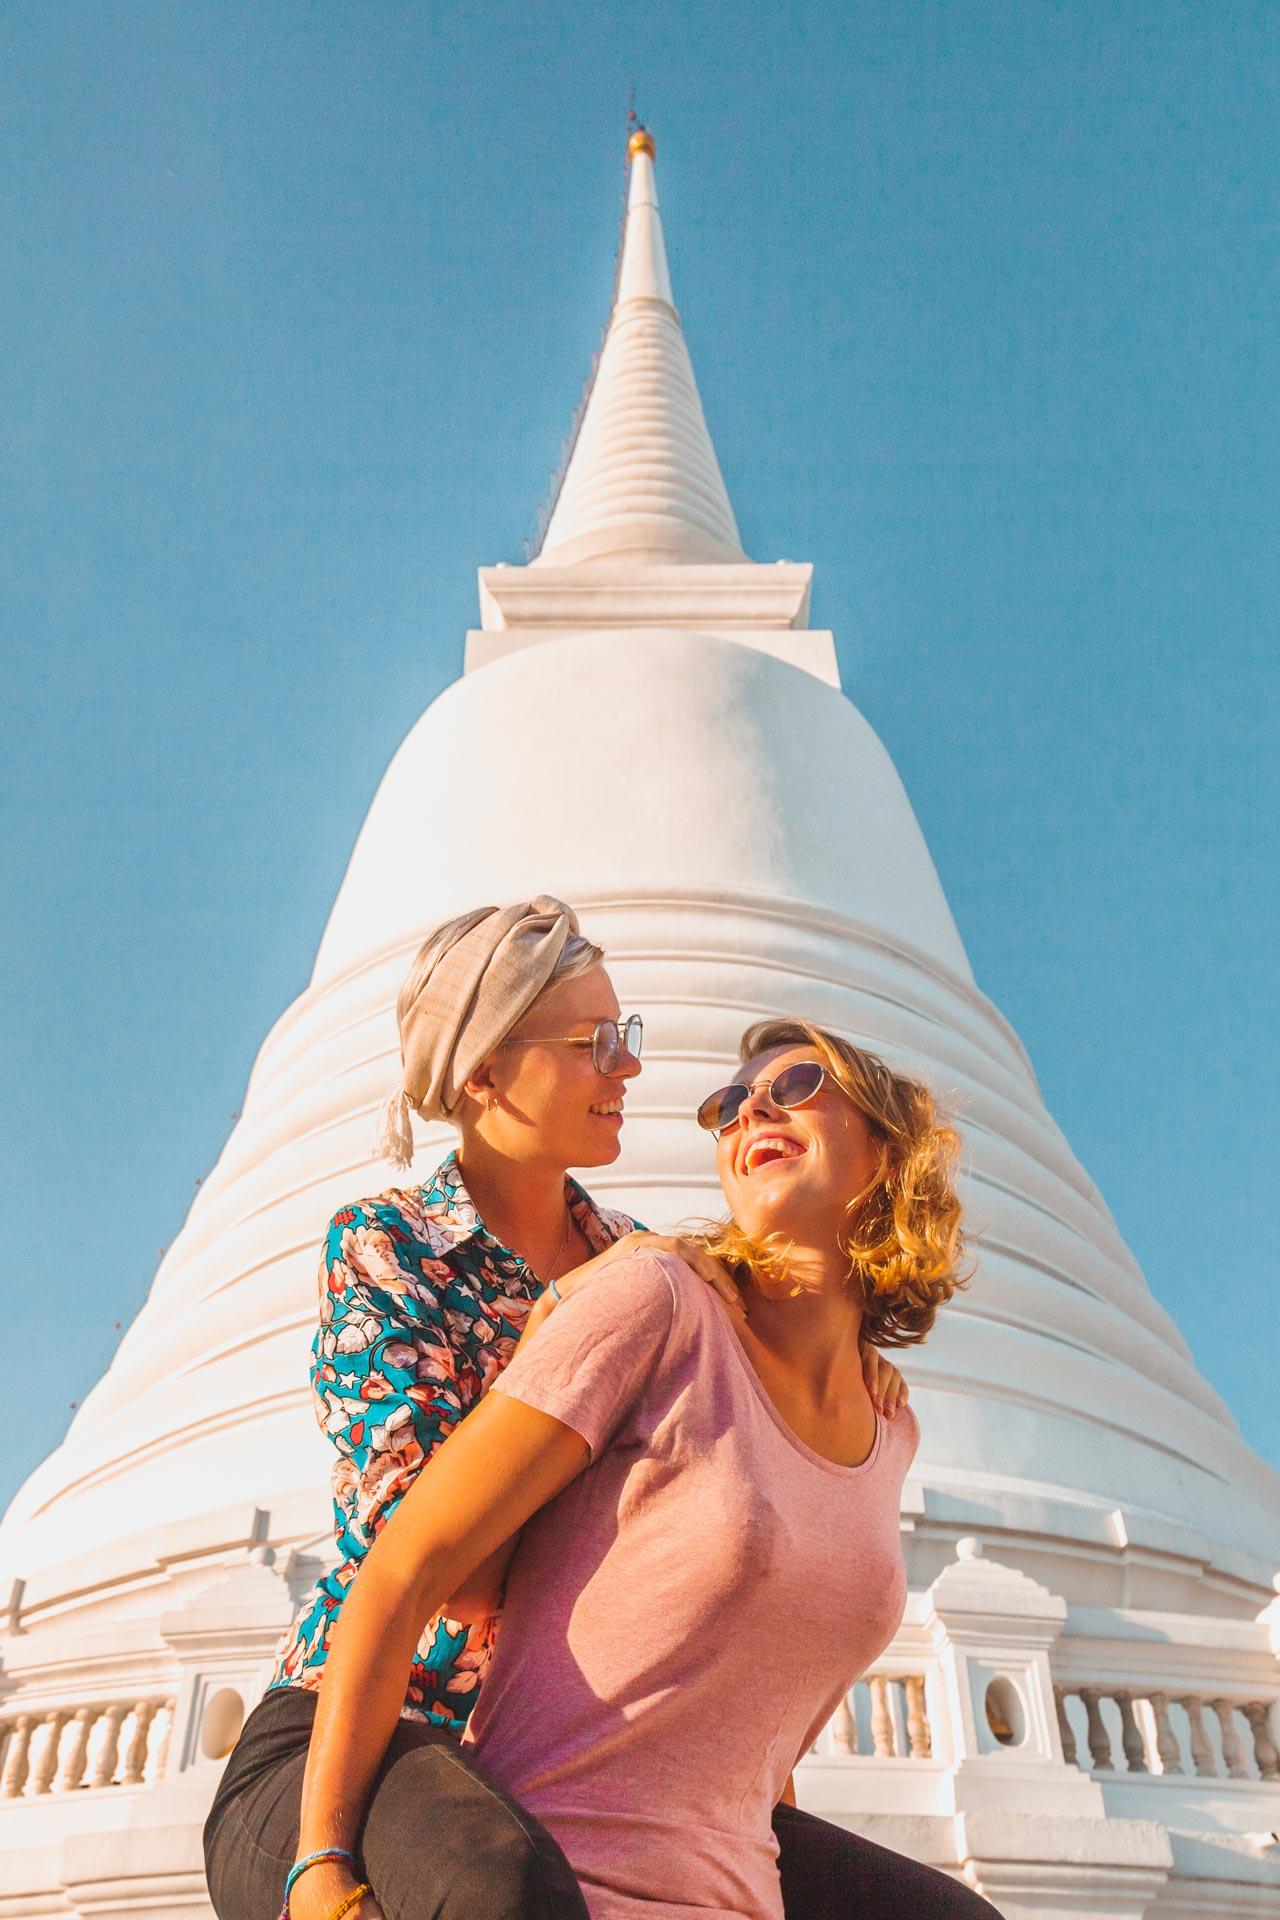 Wat Prayoon, Wat Prayunwongsawat, Thonburi, Temple, Bangkok